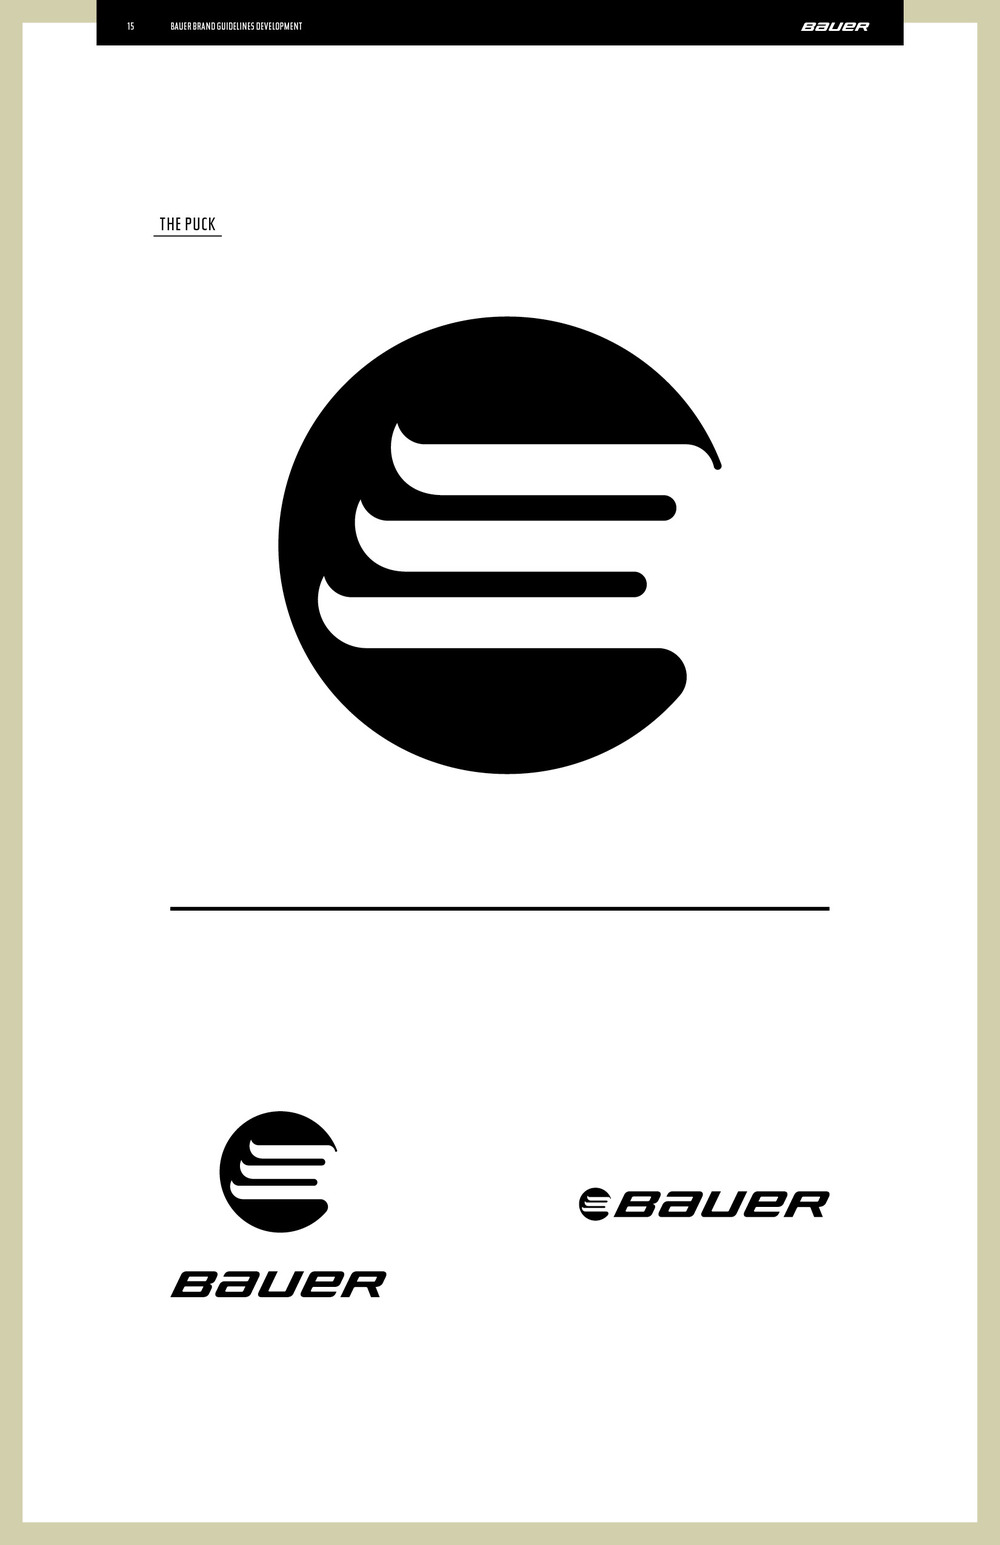 bauer_toolkit15.jpg